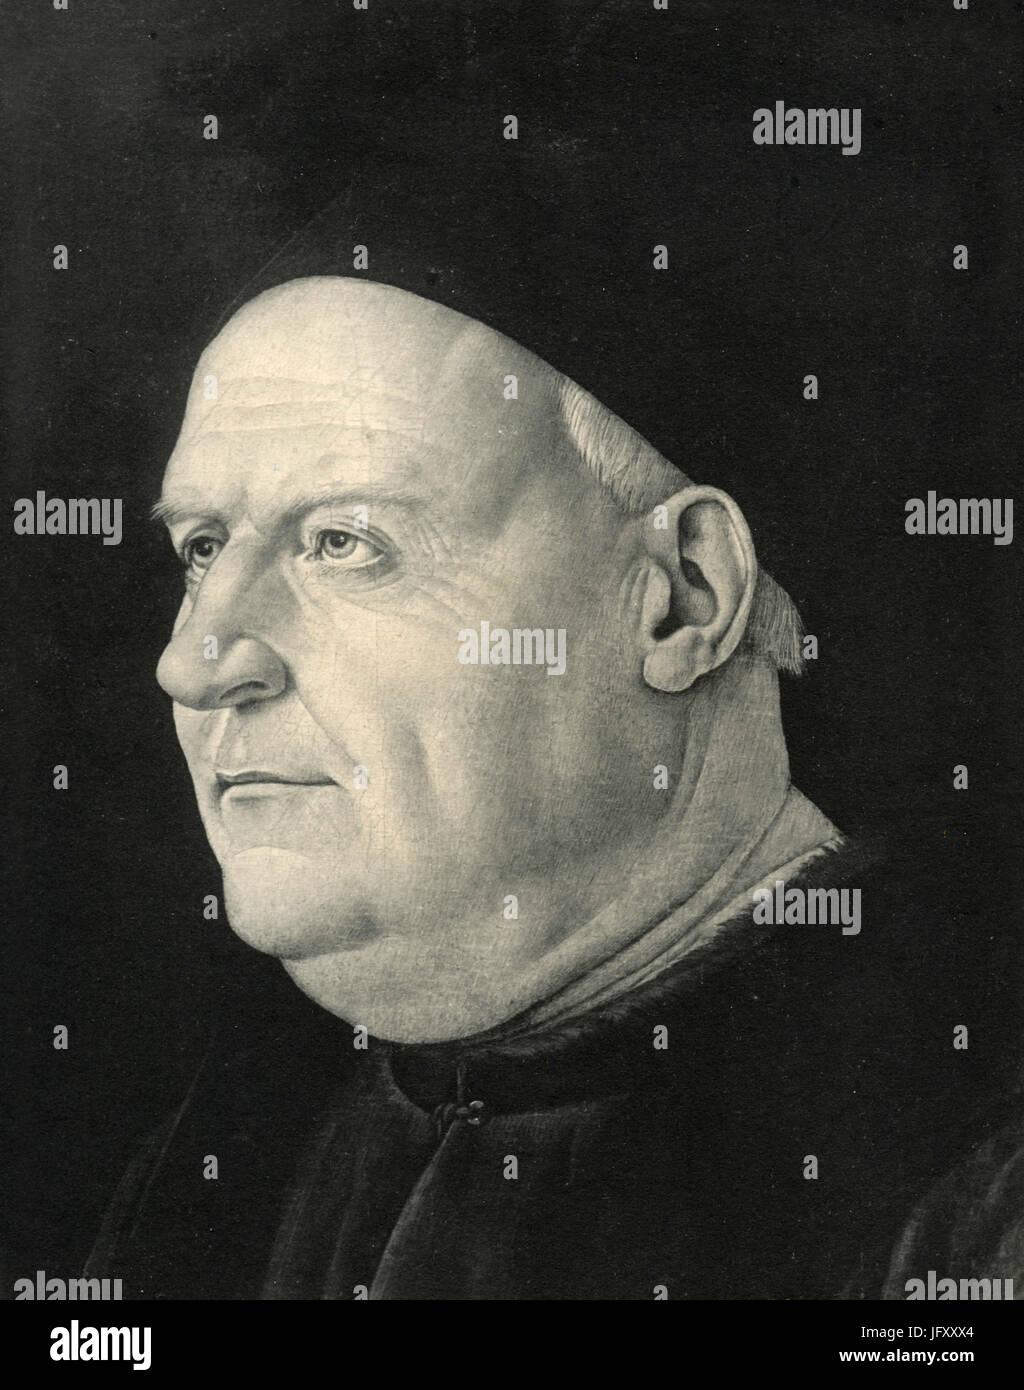 A Venetian Senator, painting by Buonsignori, London, UK - Stock Image